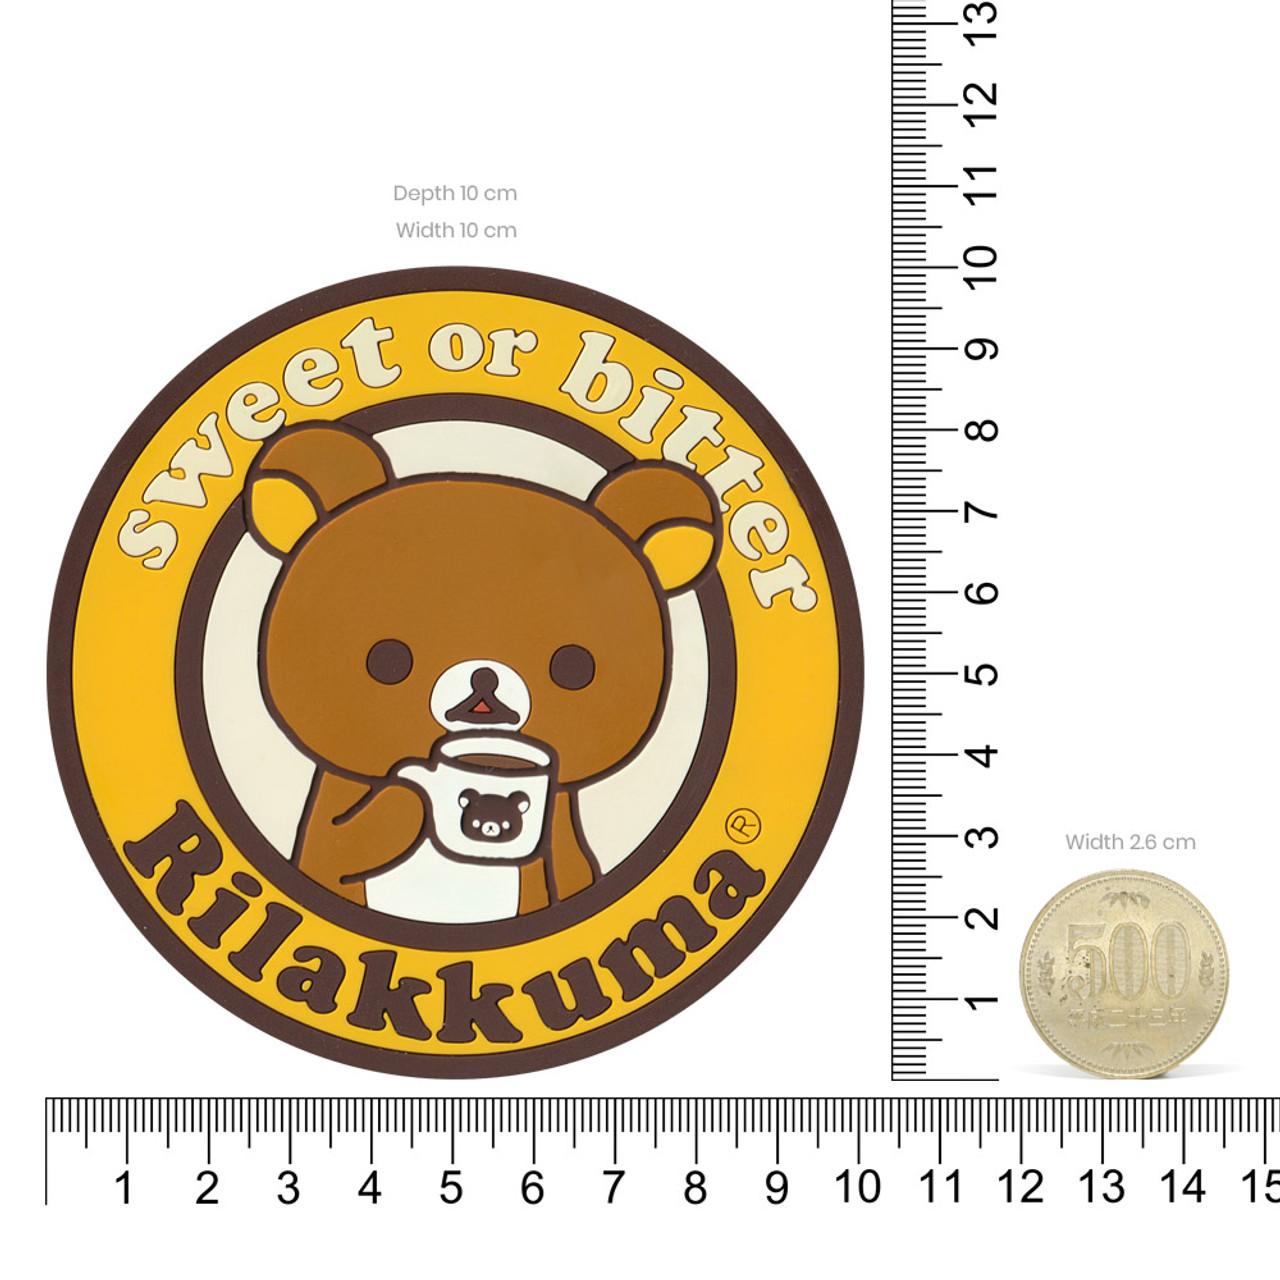 San-x Rilakkuma Circle Chocolate Coffee Mug Coaster - KY00901 ( Proportion )